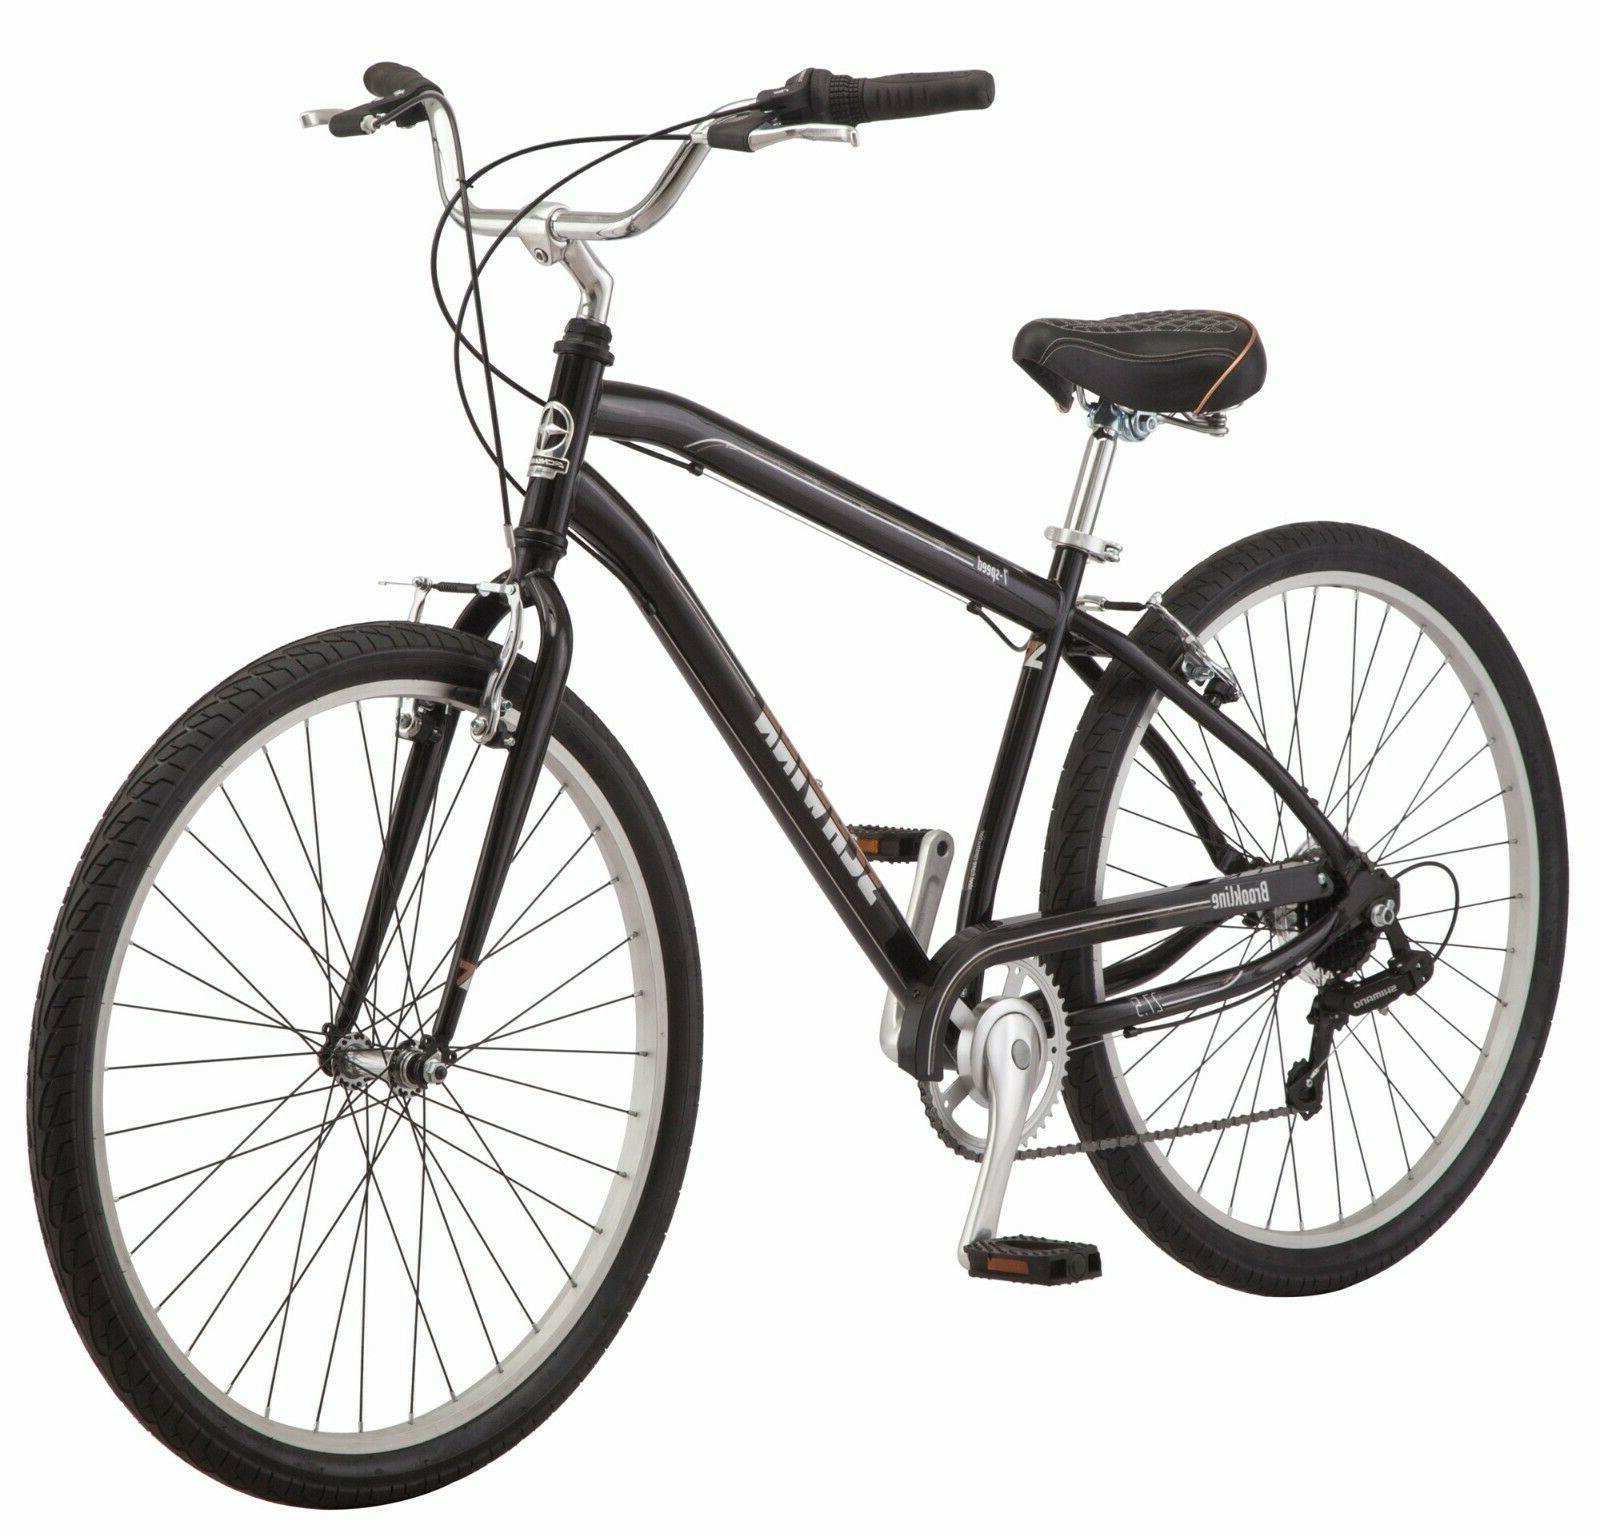 brookline cruiser bike 27 5 inch wheel